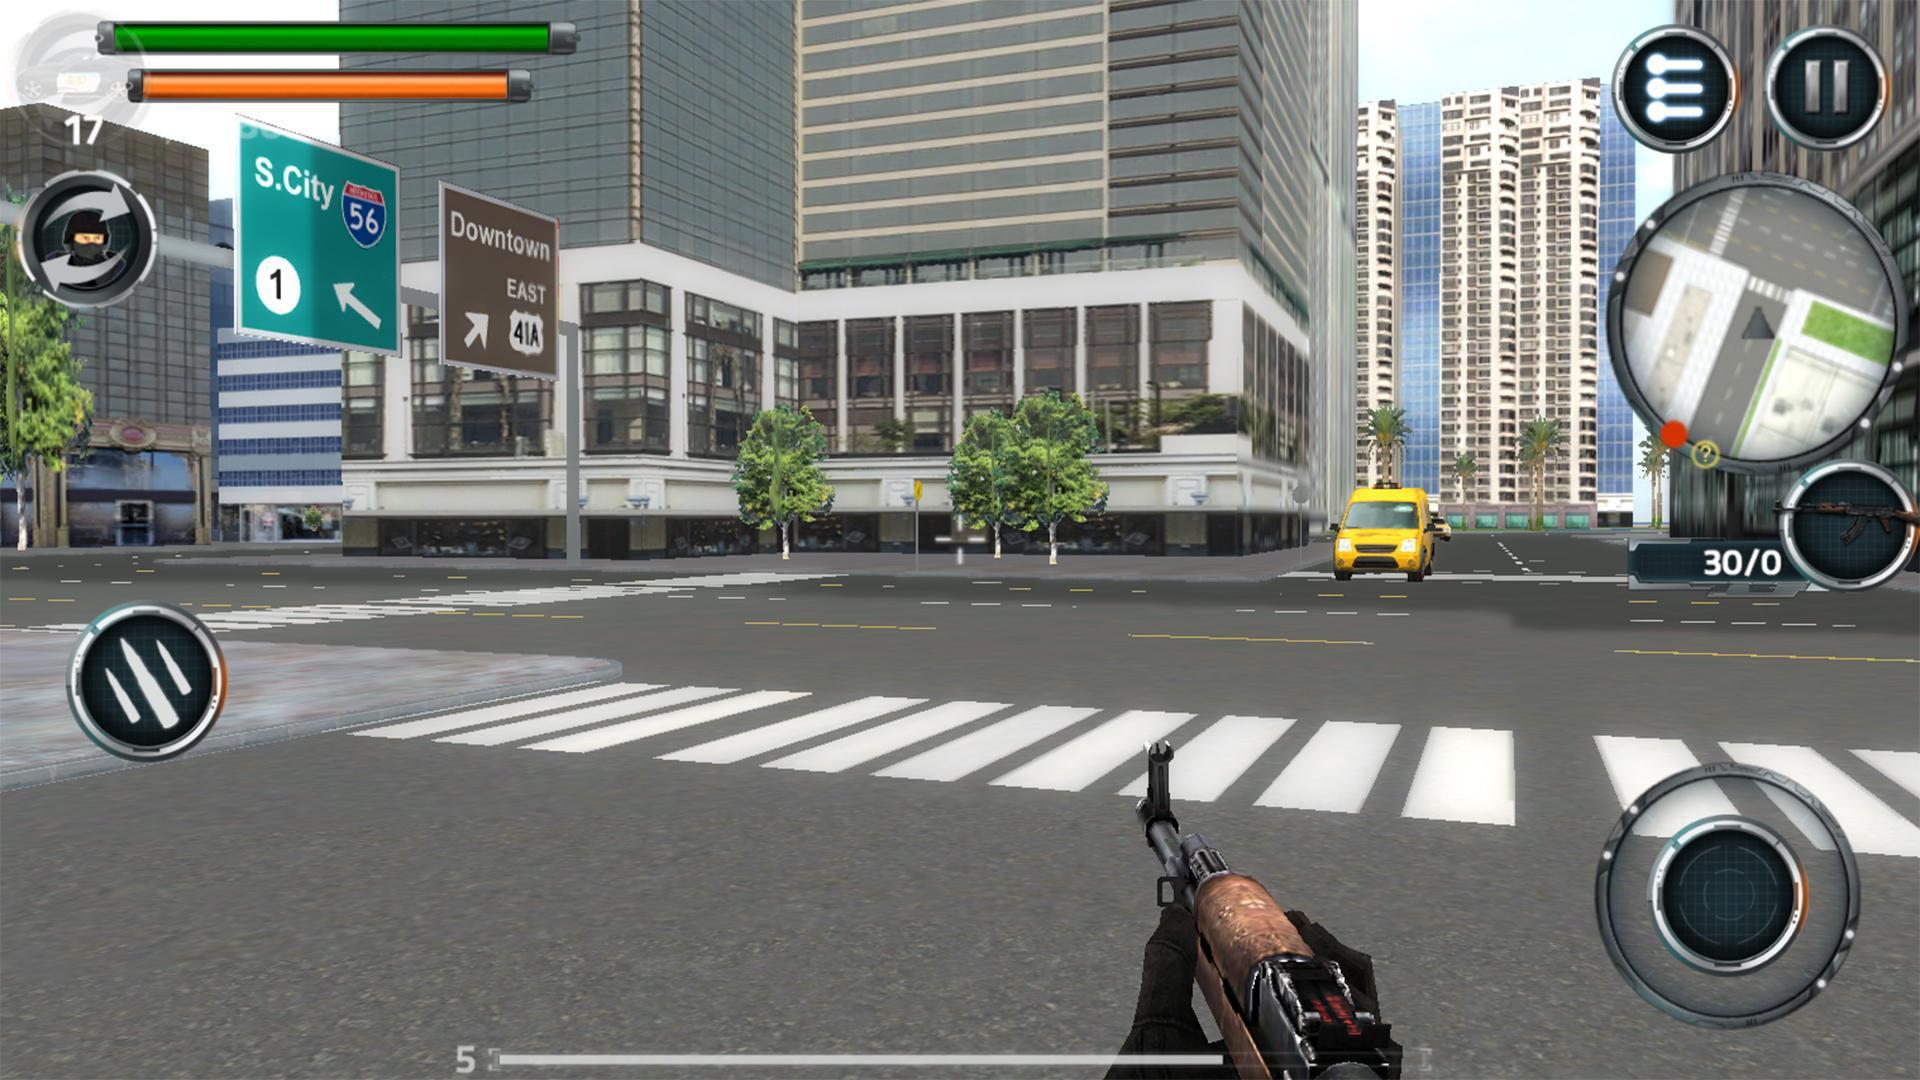 Crimopolis - Cop Simulator 3D 游戏截图1